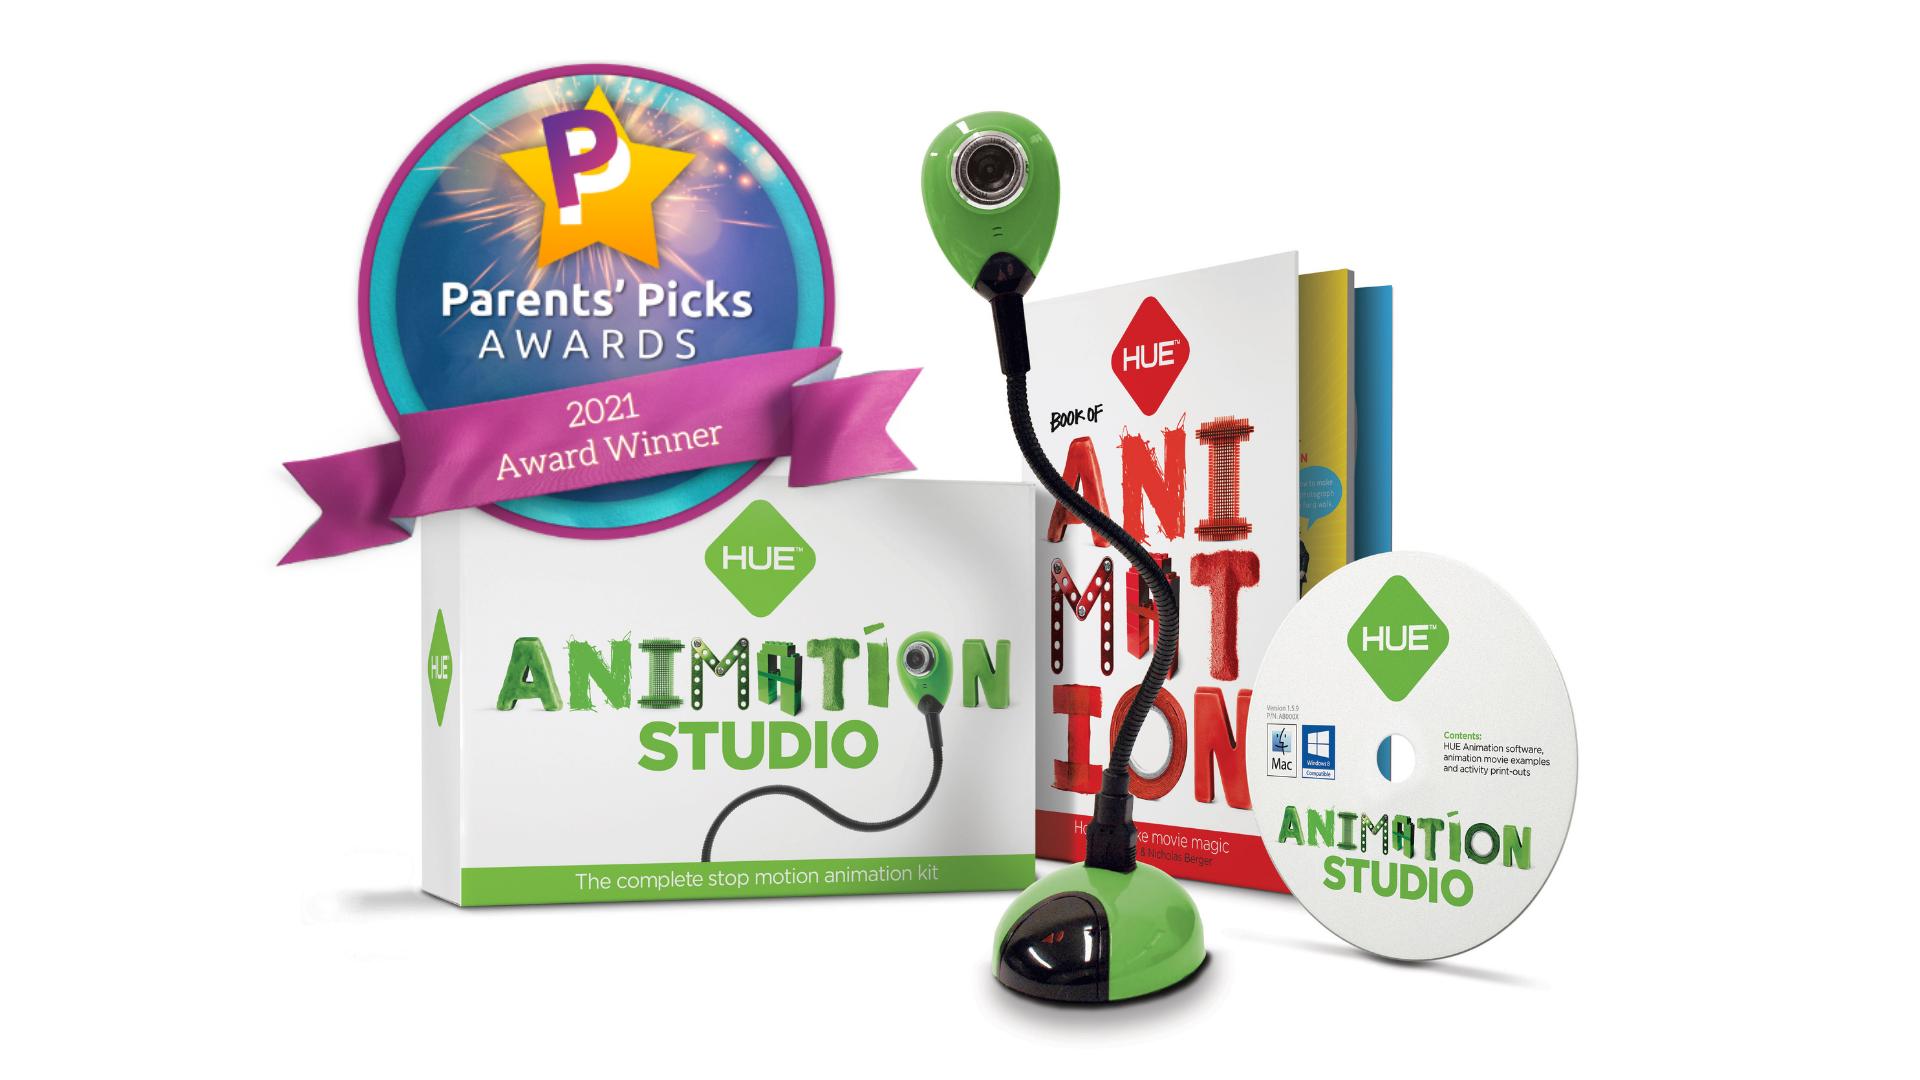 HUE Animation Studio is a Parents' Picks 2021 Award Winner!